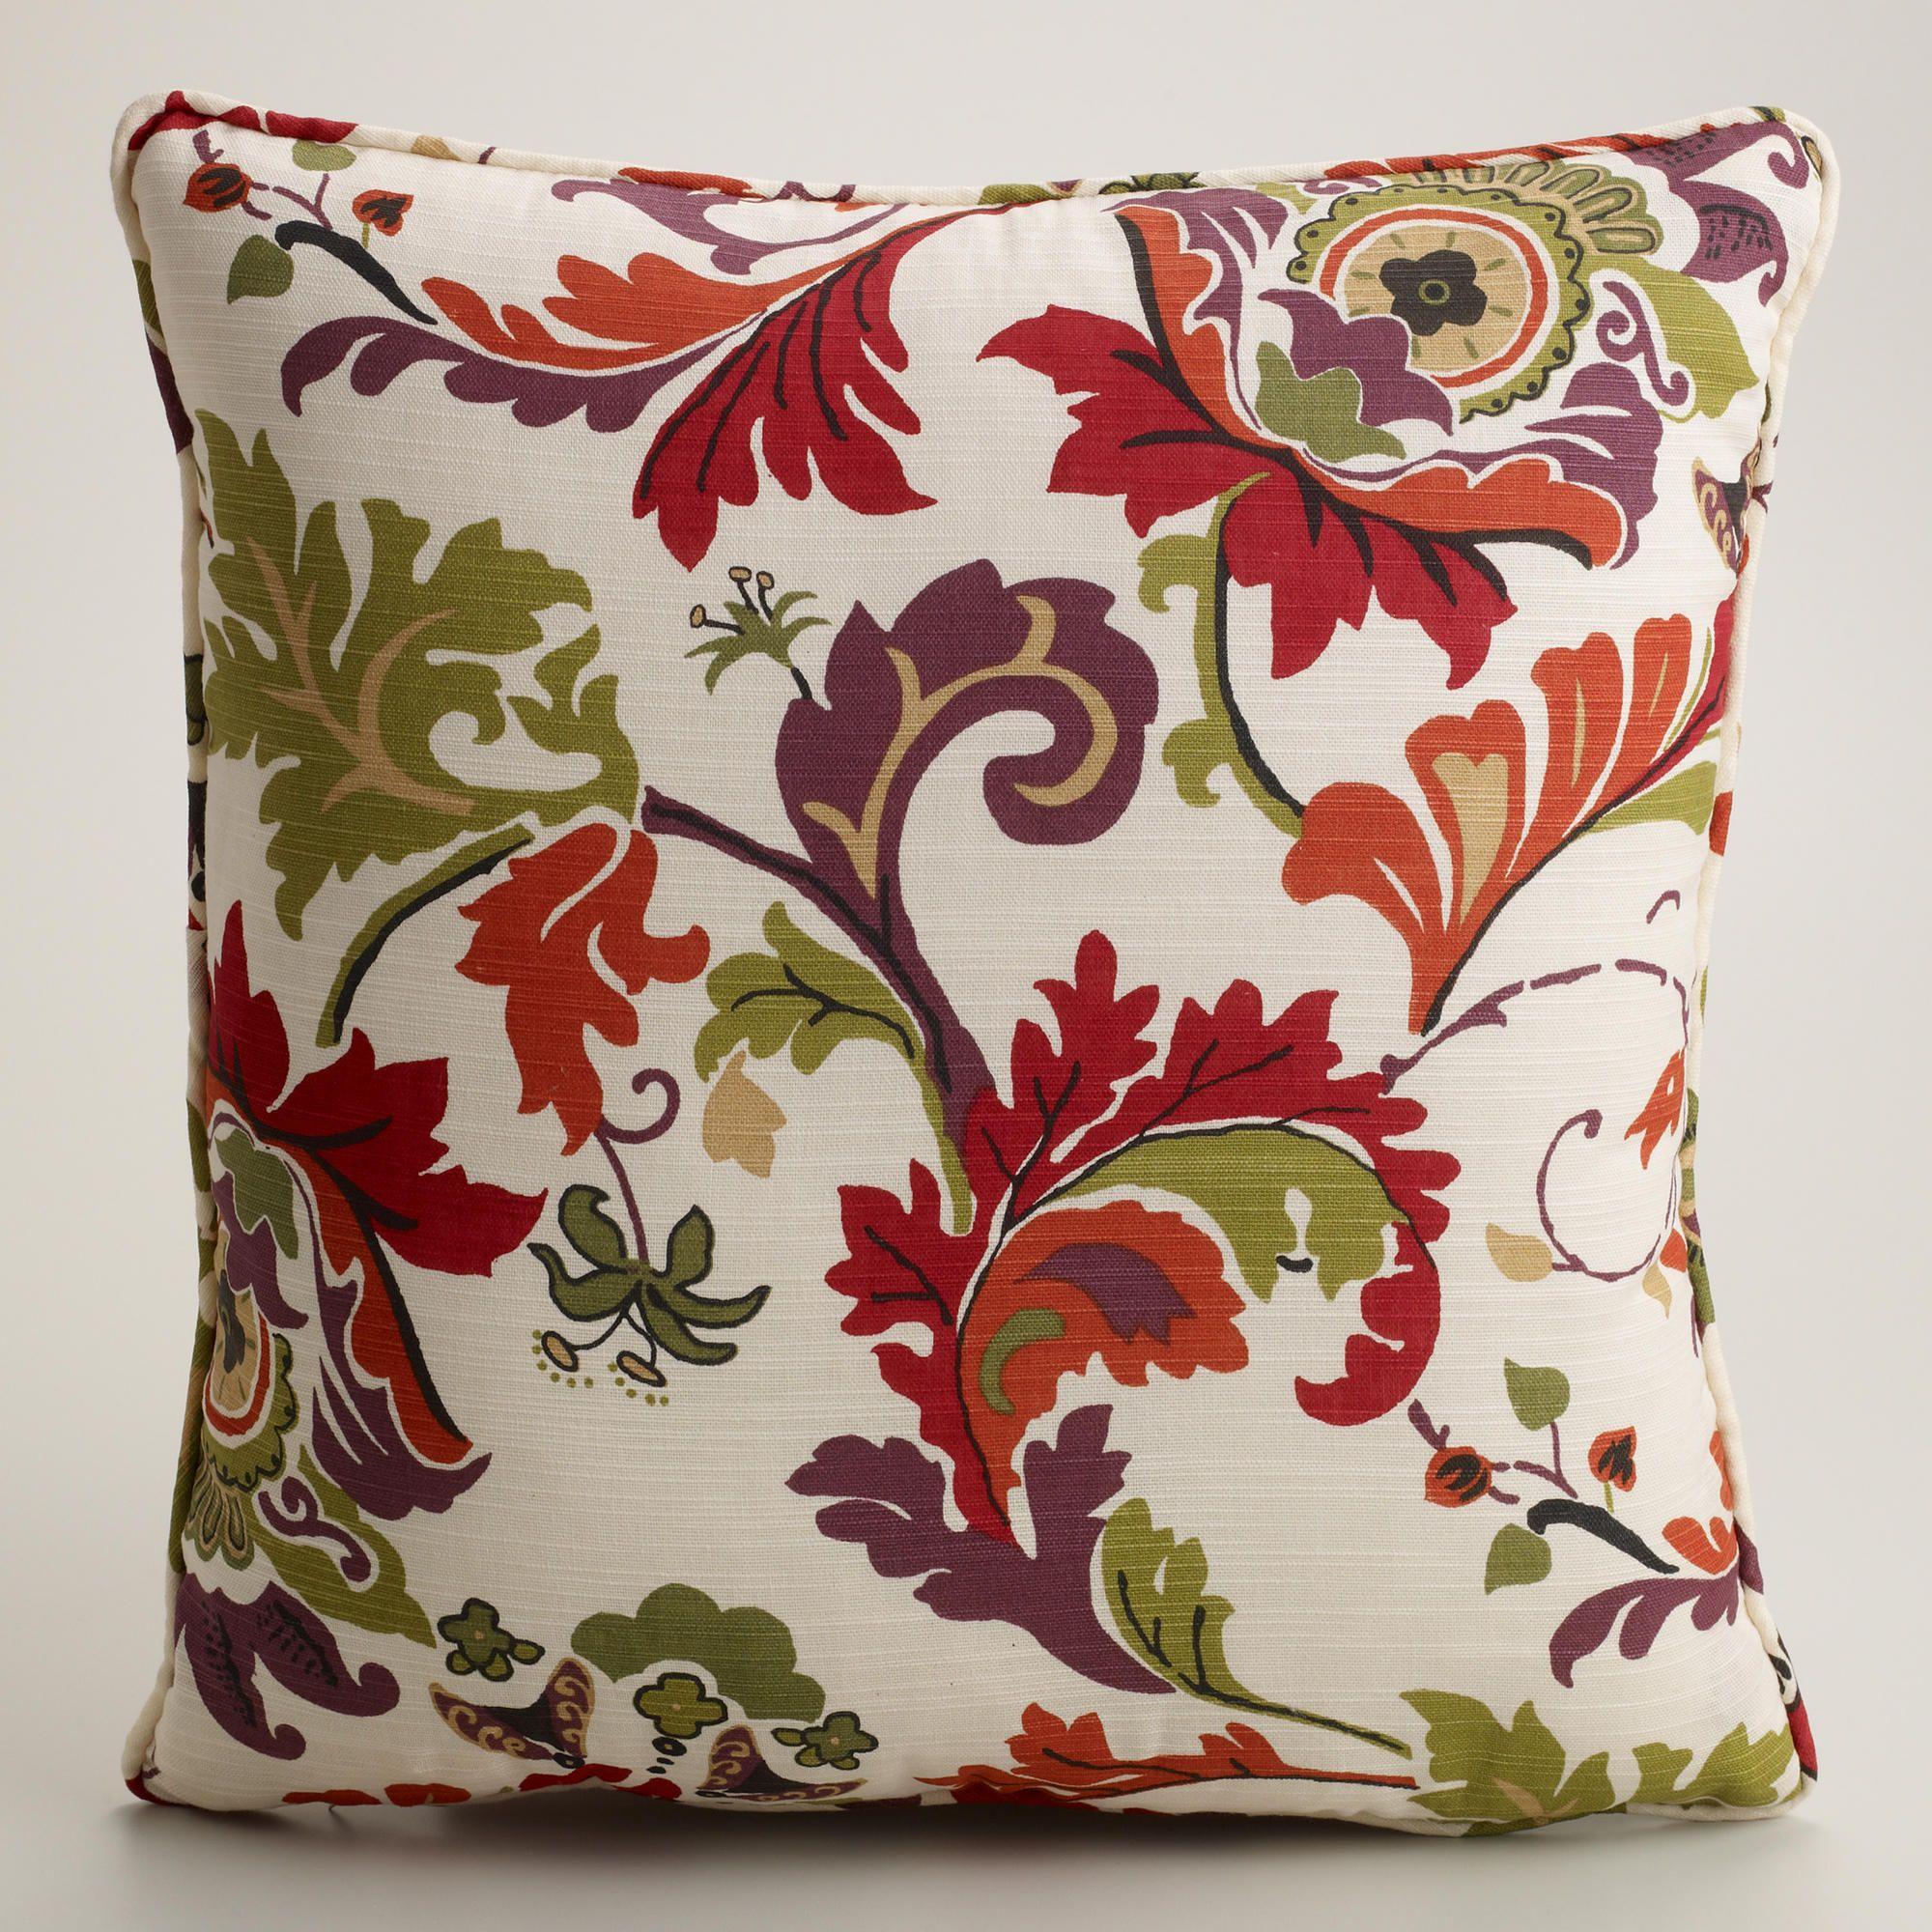 Campione Multicolor Throw Pillow | Throw pillows, Pillows and ...